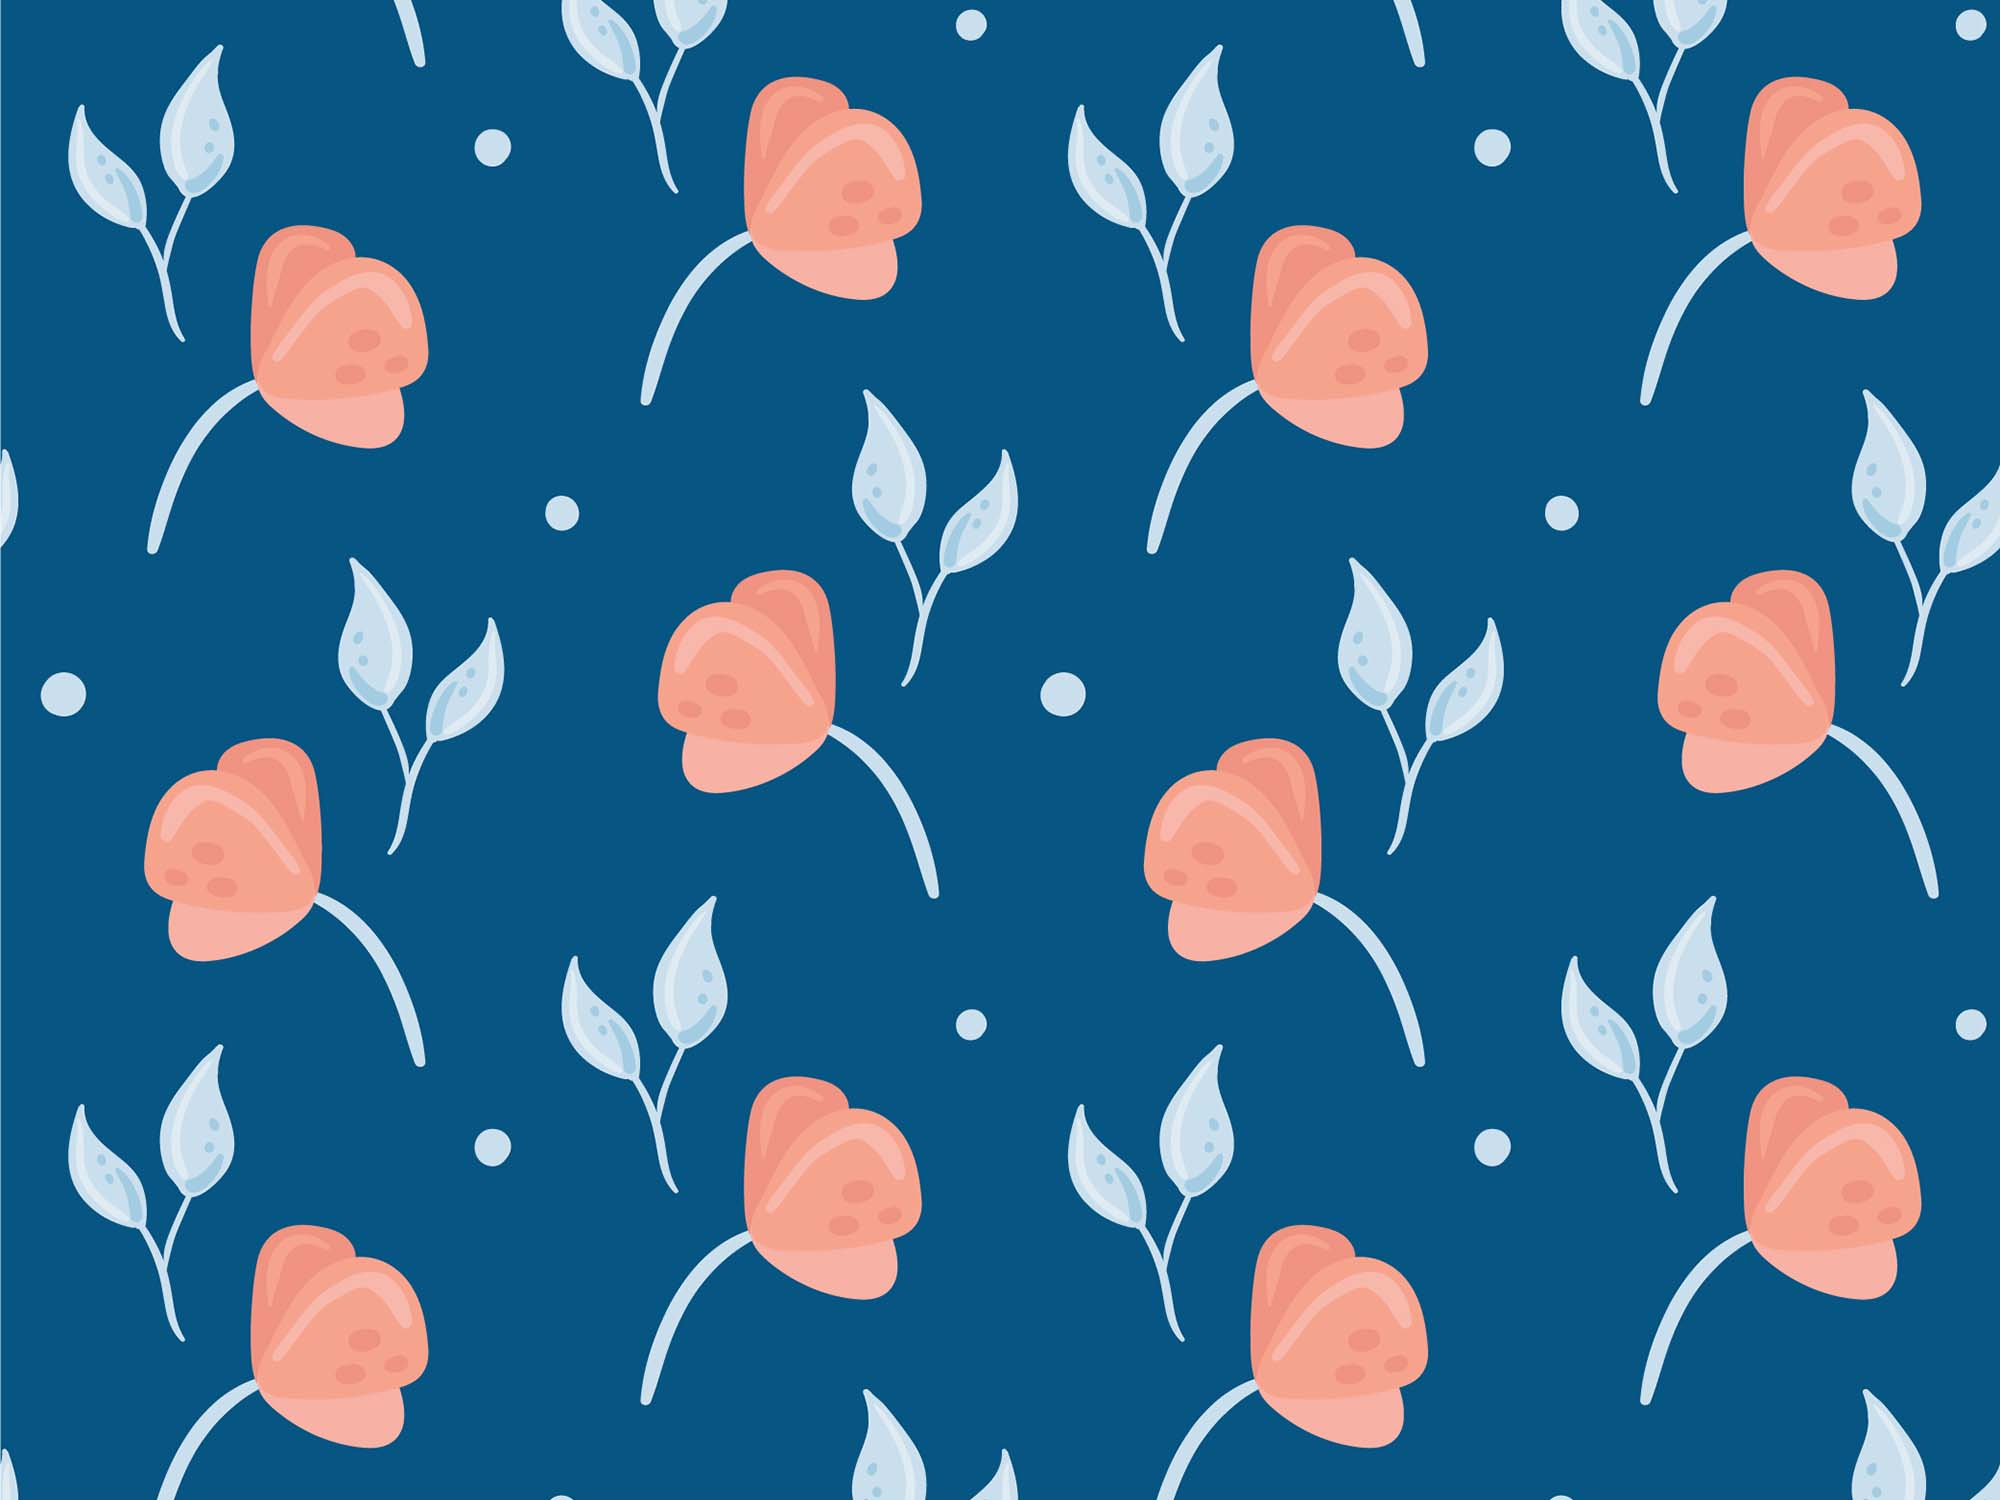 Floral Vector Patterns 1